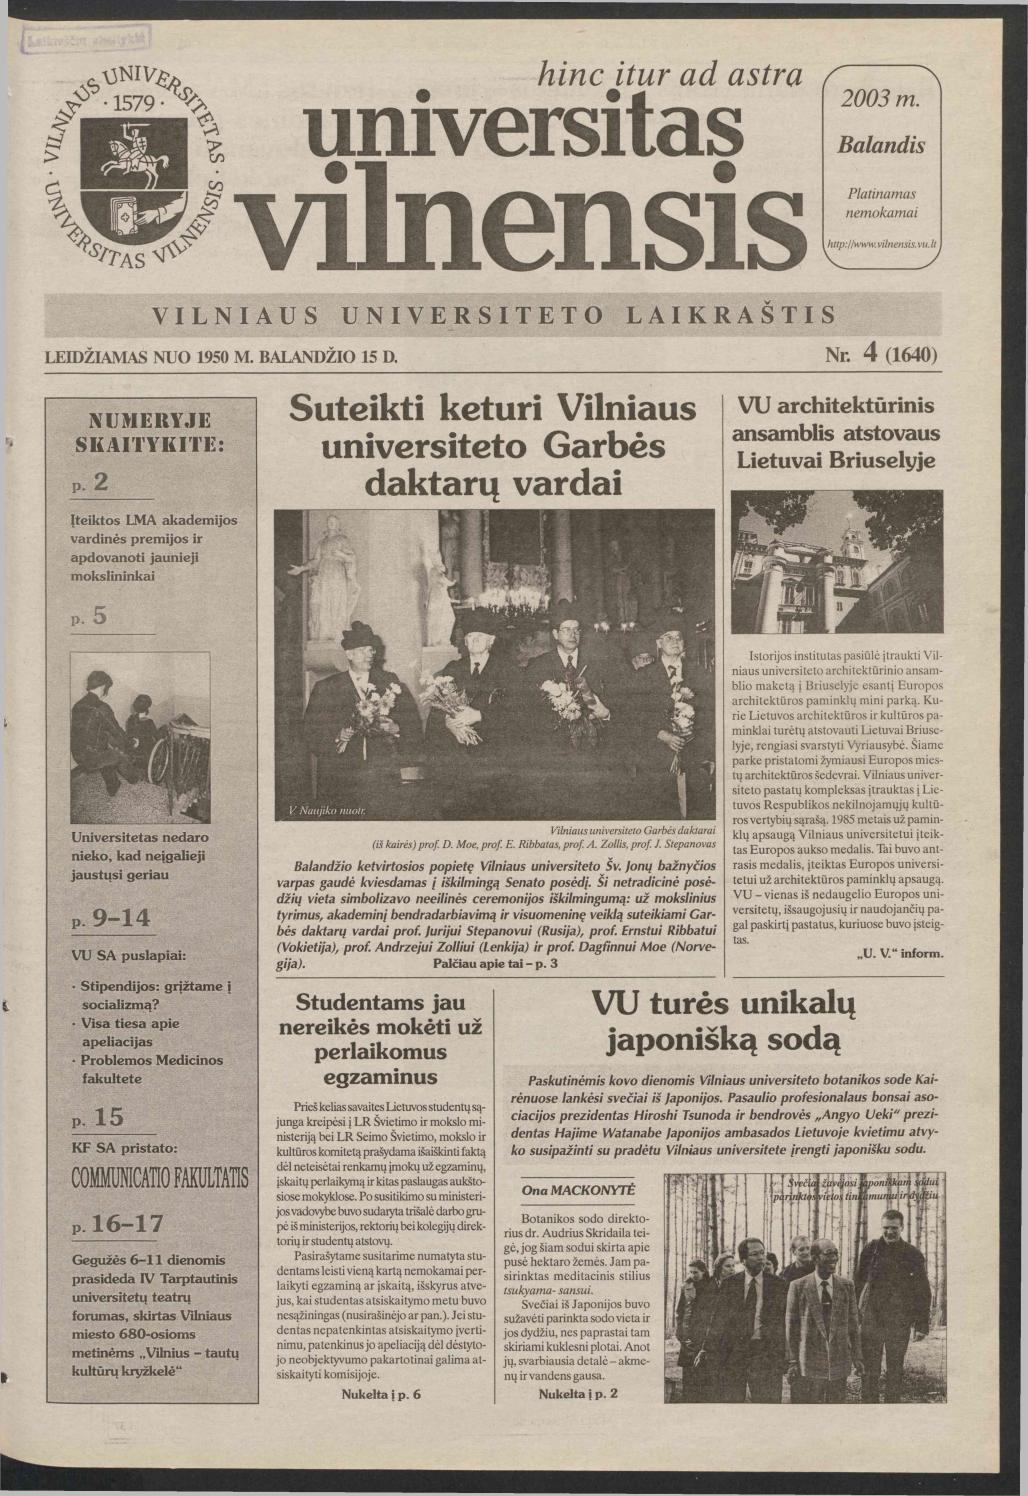 Universitas Vilnensis, 2003 m  balandis Nr  4 (1640) by